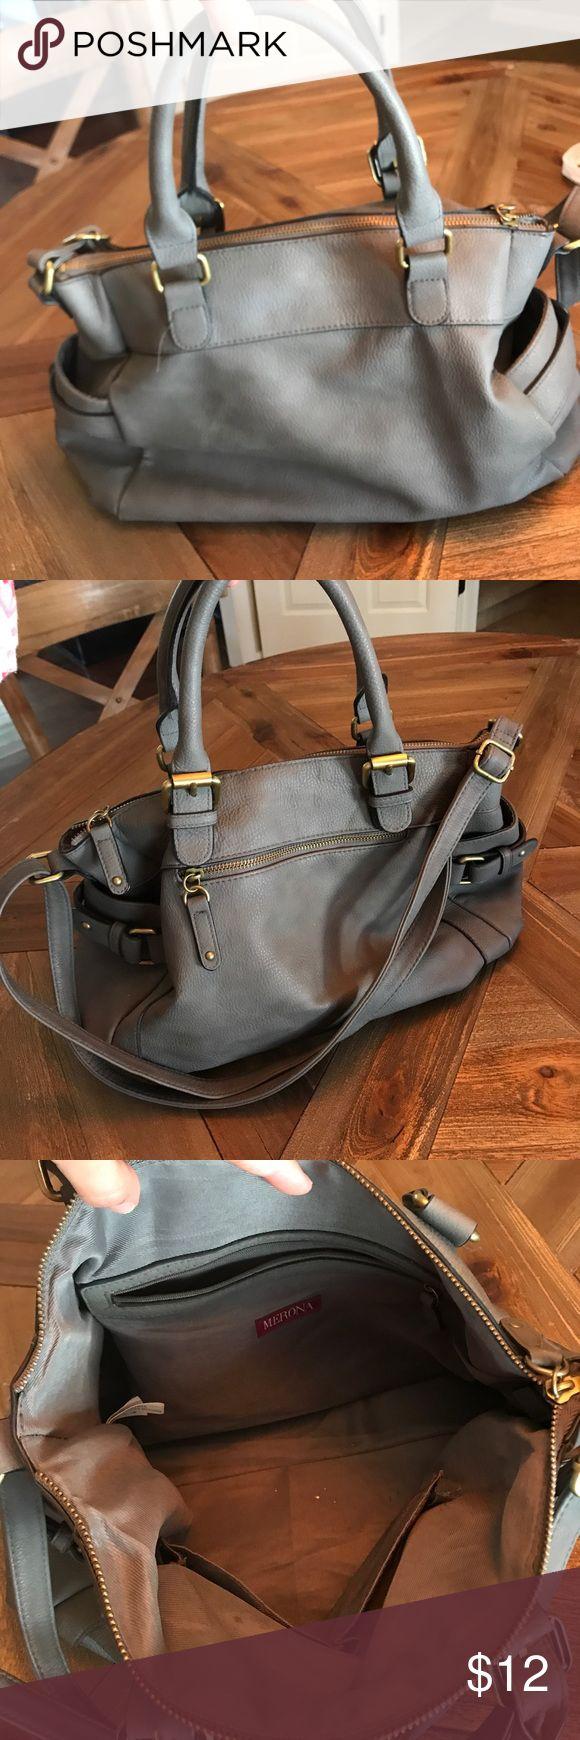 Merona purse! Grey Merona for Target purse! Excellent condition! Merona Bags Shoulder Bags